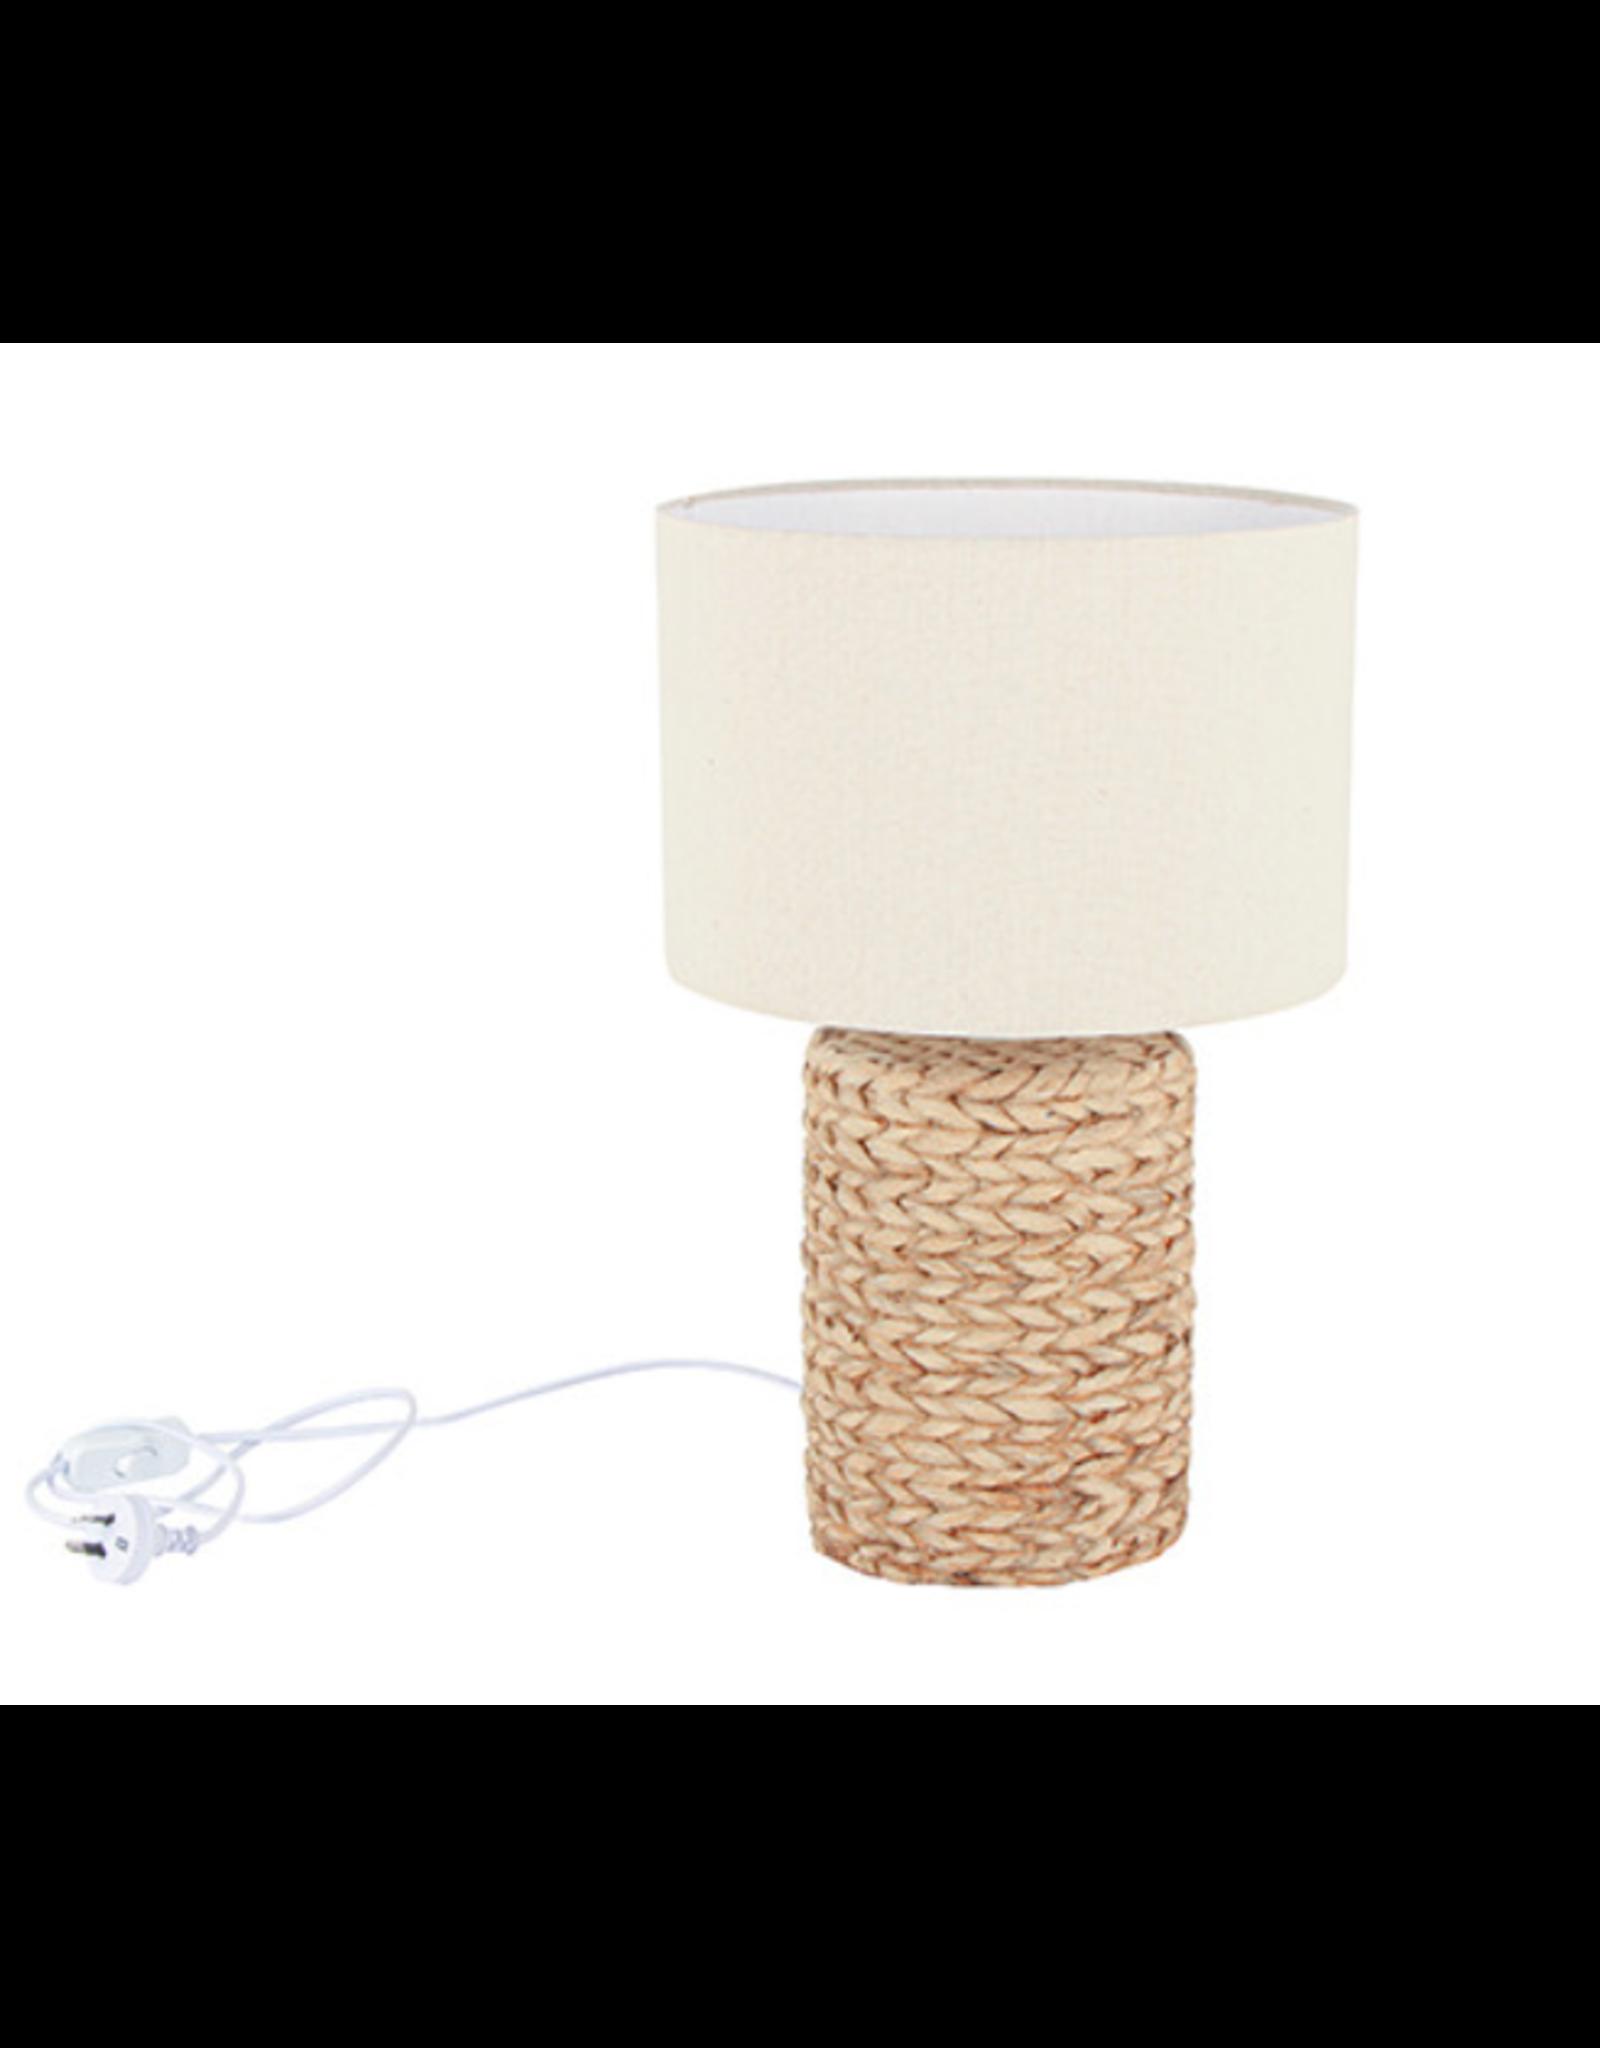 Enoch Concrete Base Table Lamp - Natural